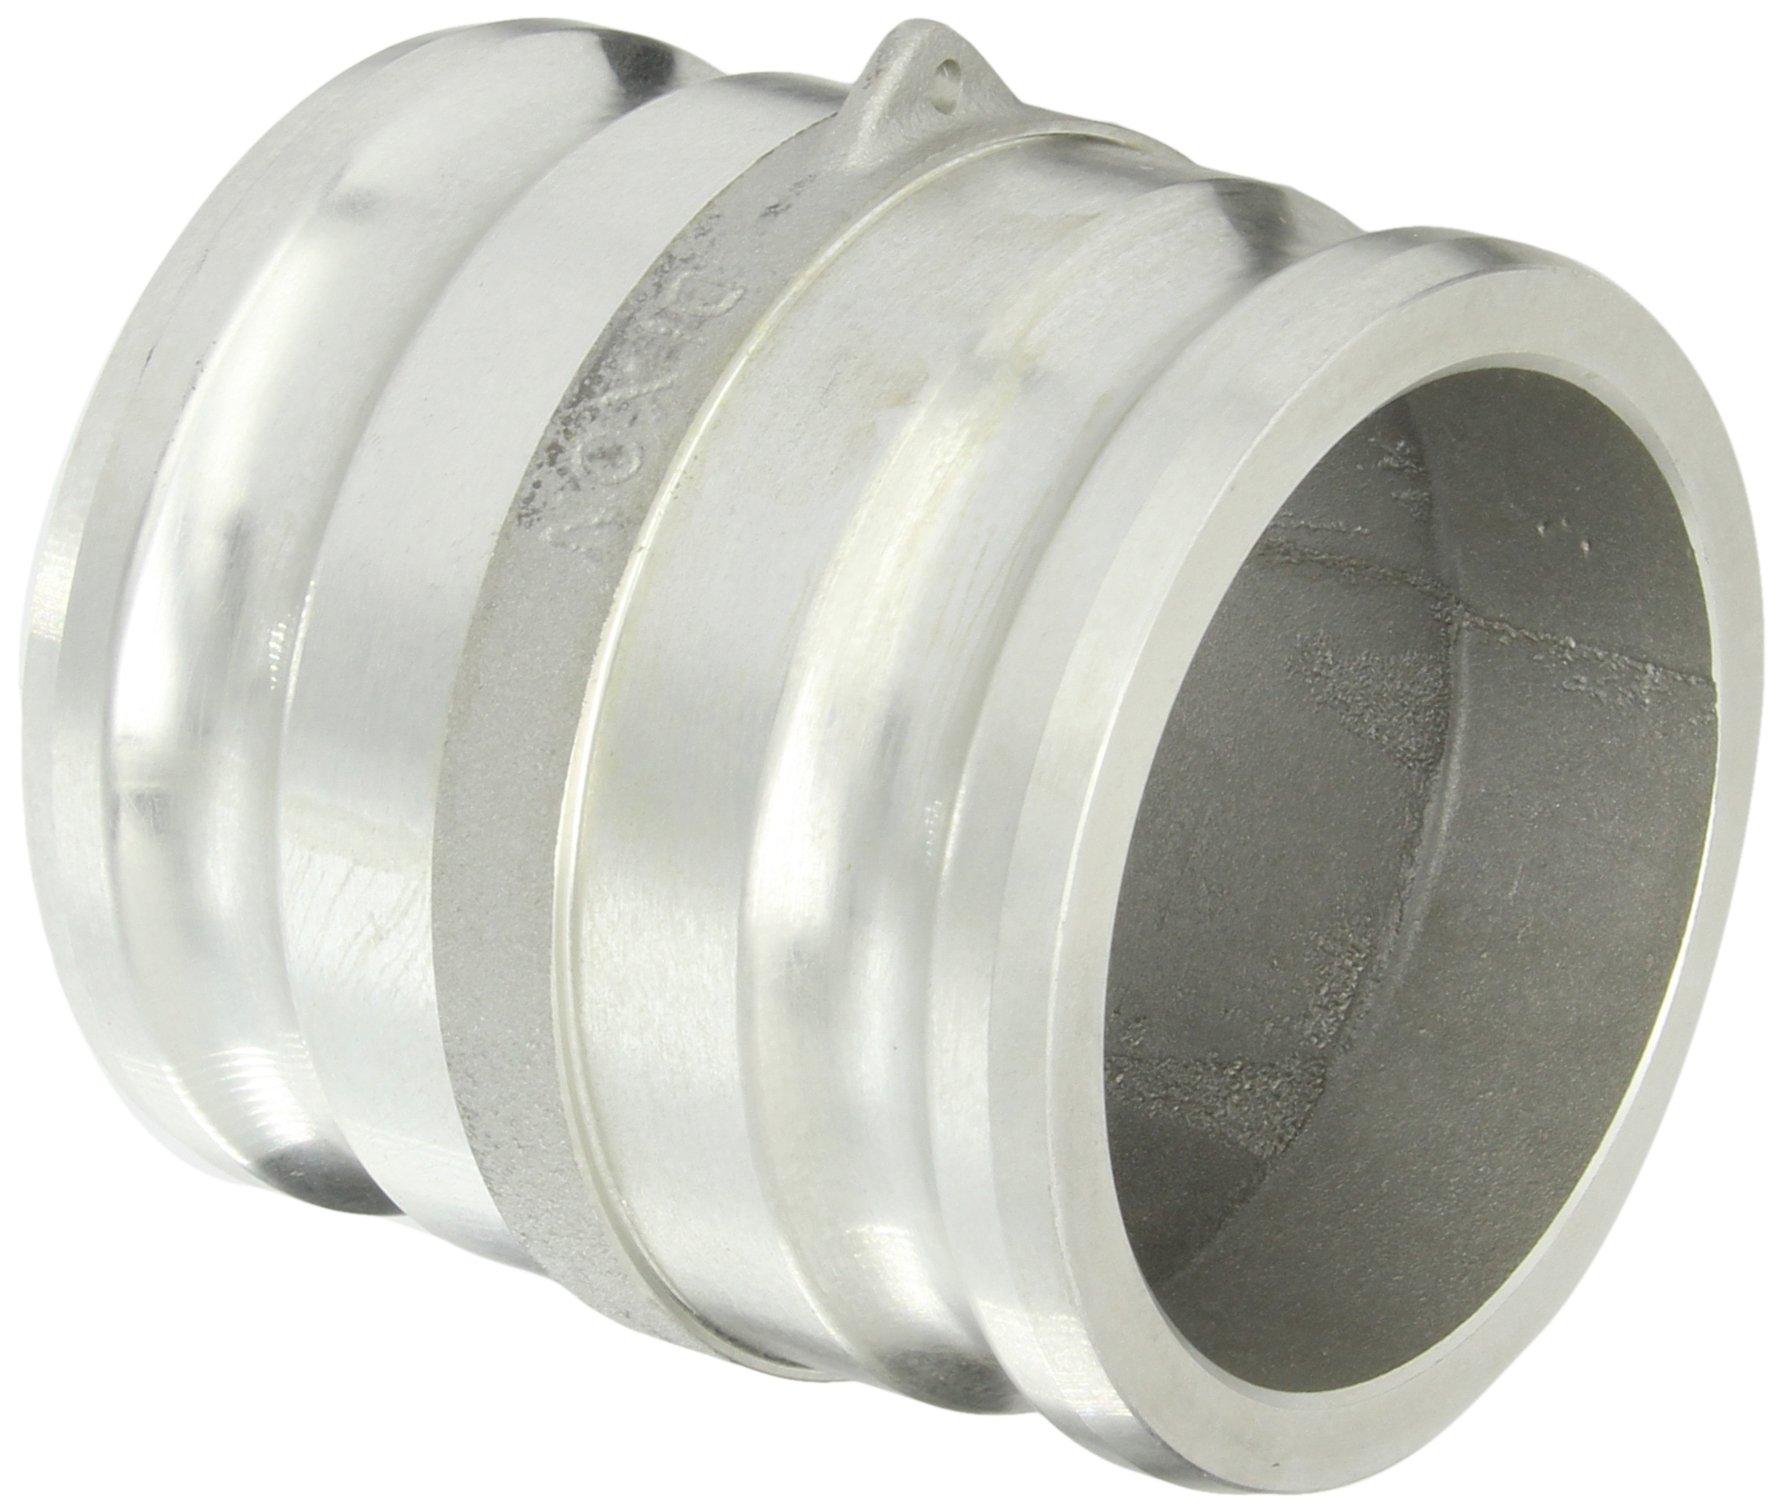 Dixon 400-AA-AL Aluminum Cam and Groove Hose Fitting, Spool Adapter, 4'' Plug